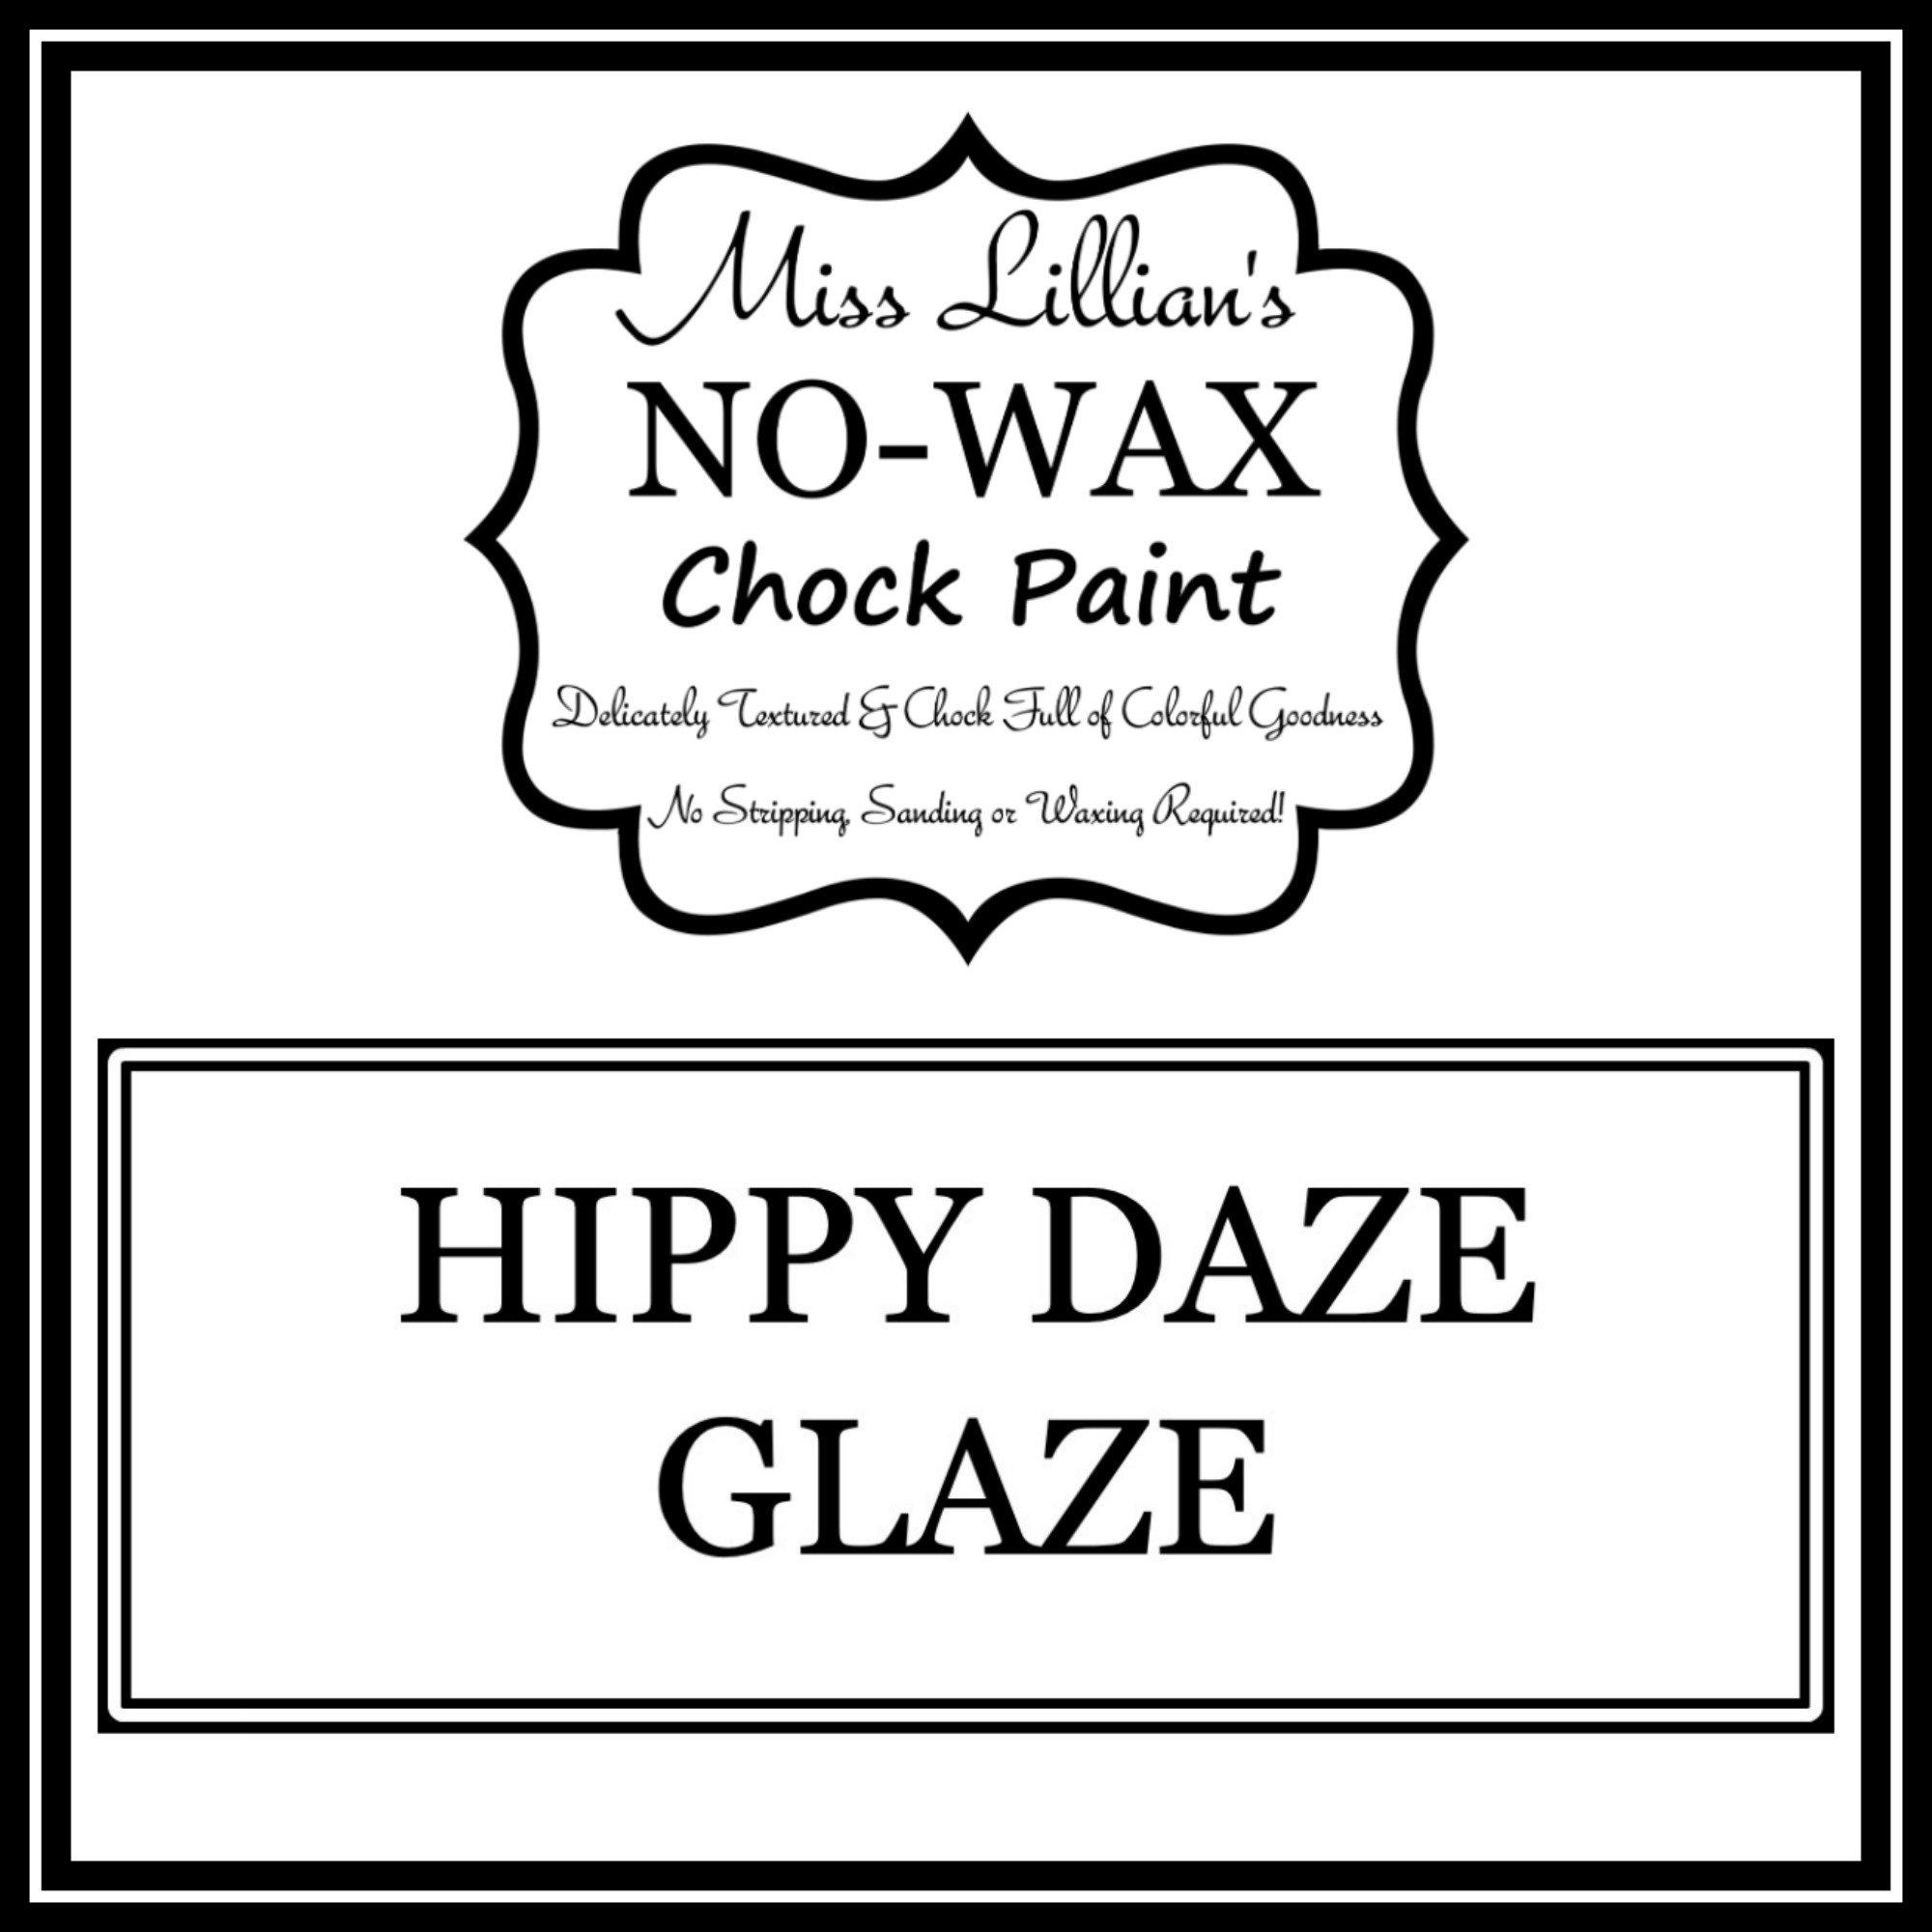 Miss Lillians Hippy Daze Glaze